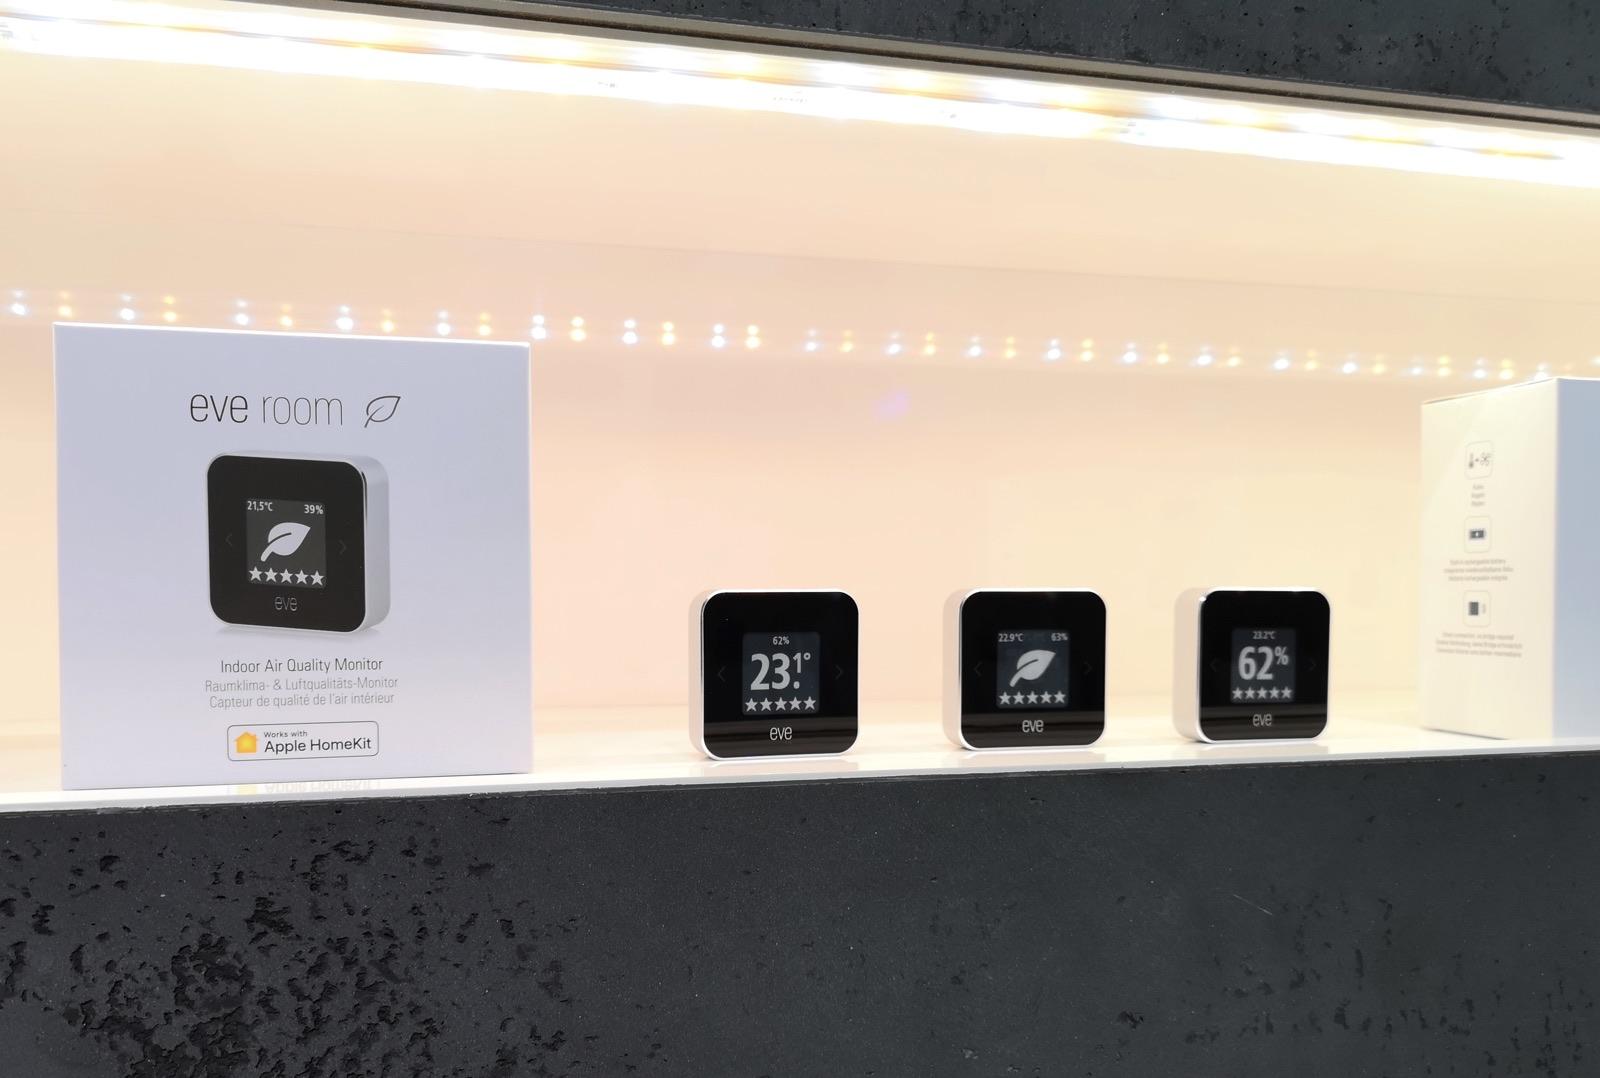 Ivy smarter kit apple homekit enabled smart kit di illuminazione